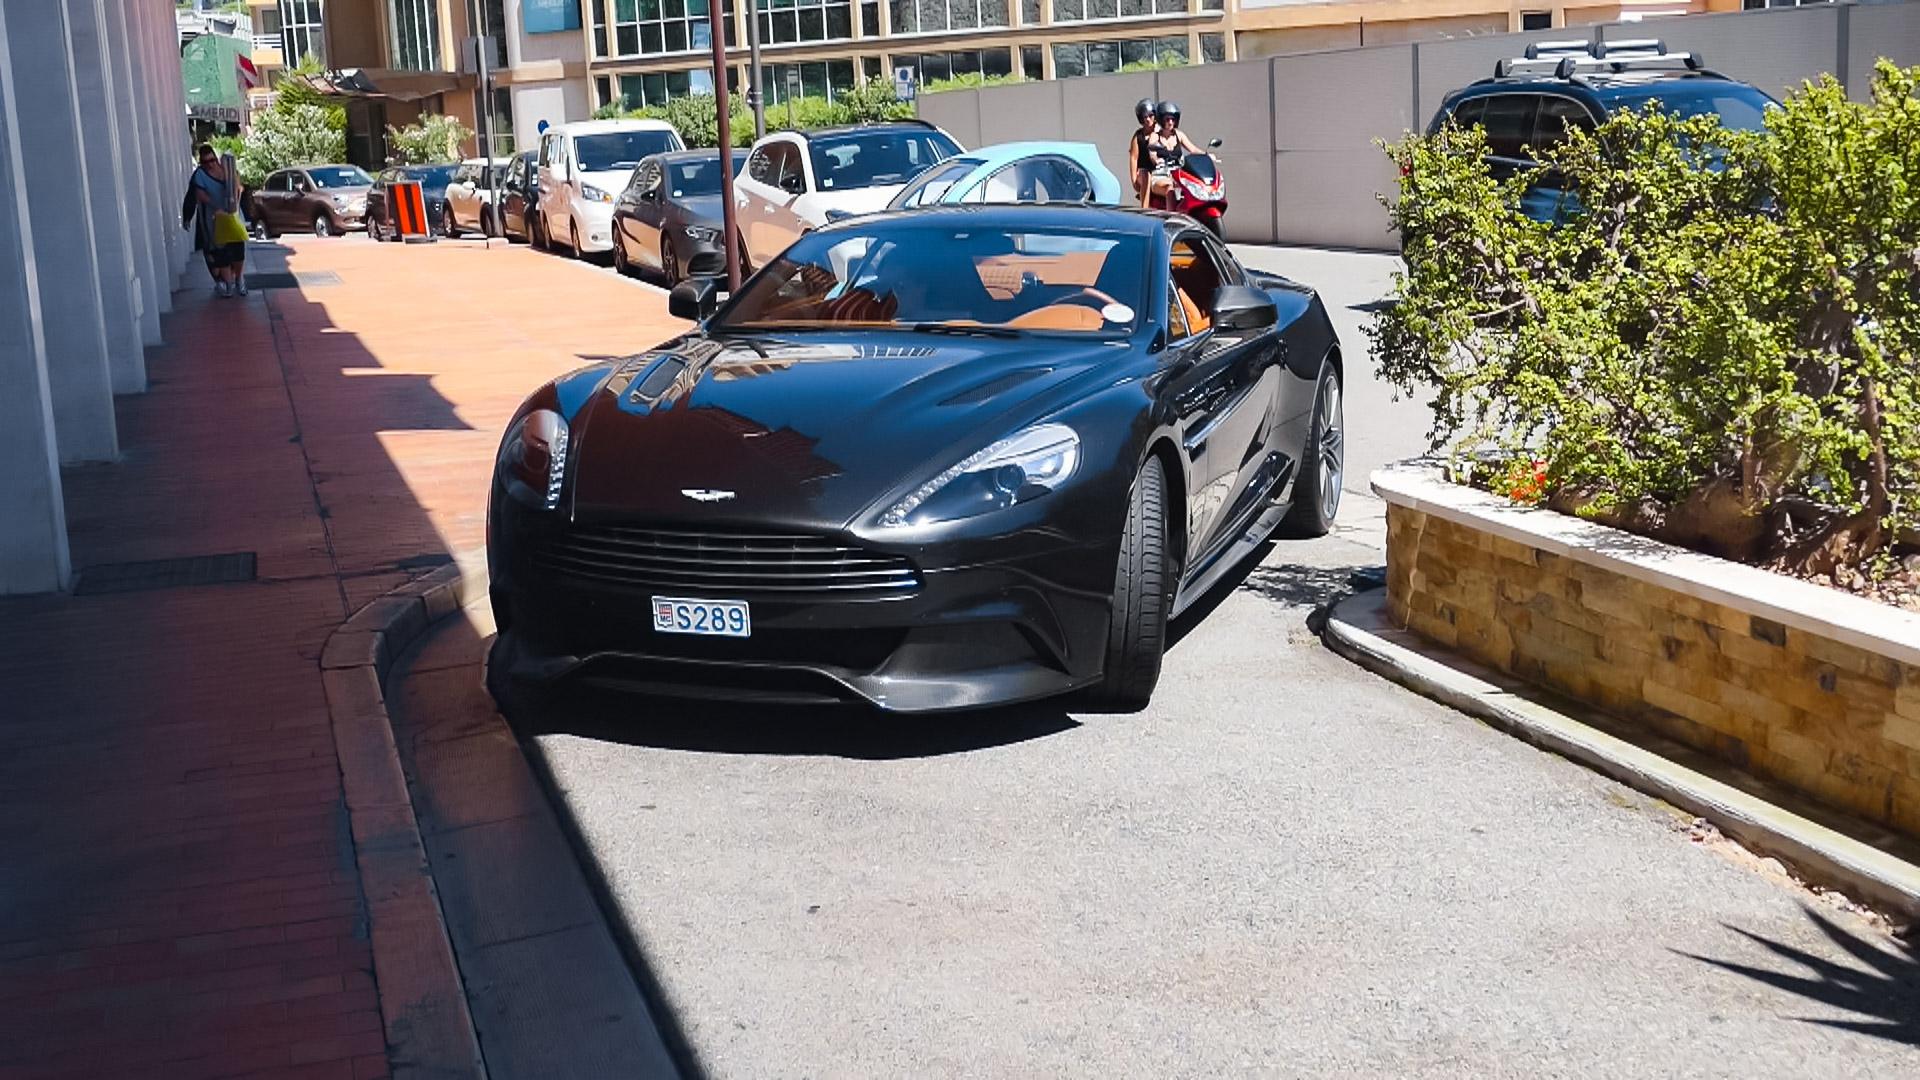 Aston Martin Vanquish S - S289 (MC)